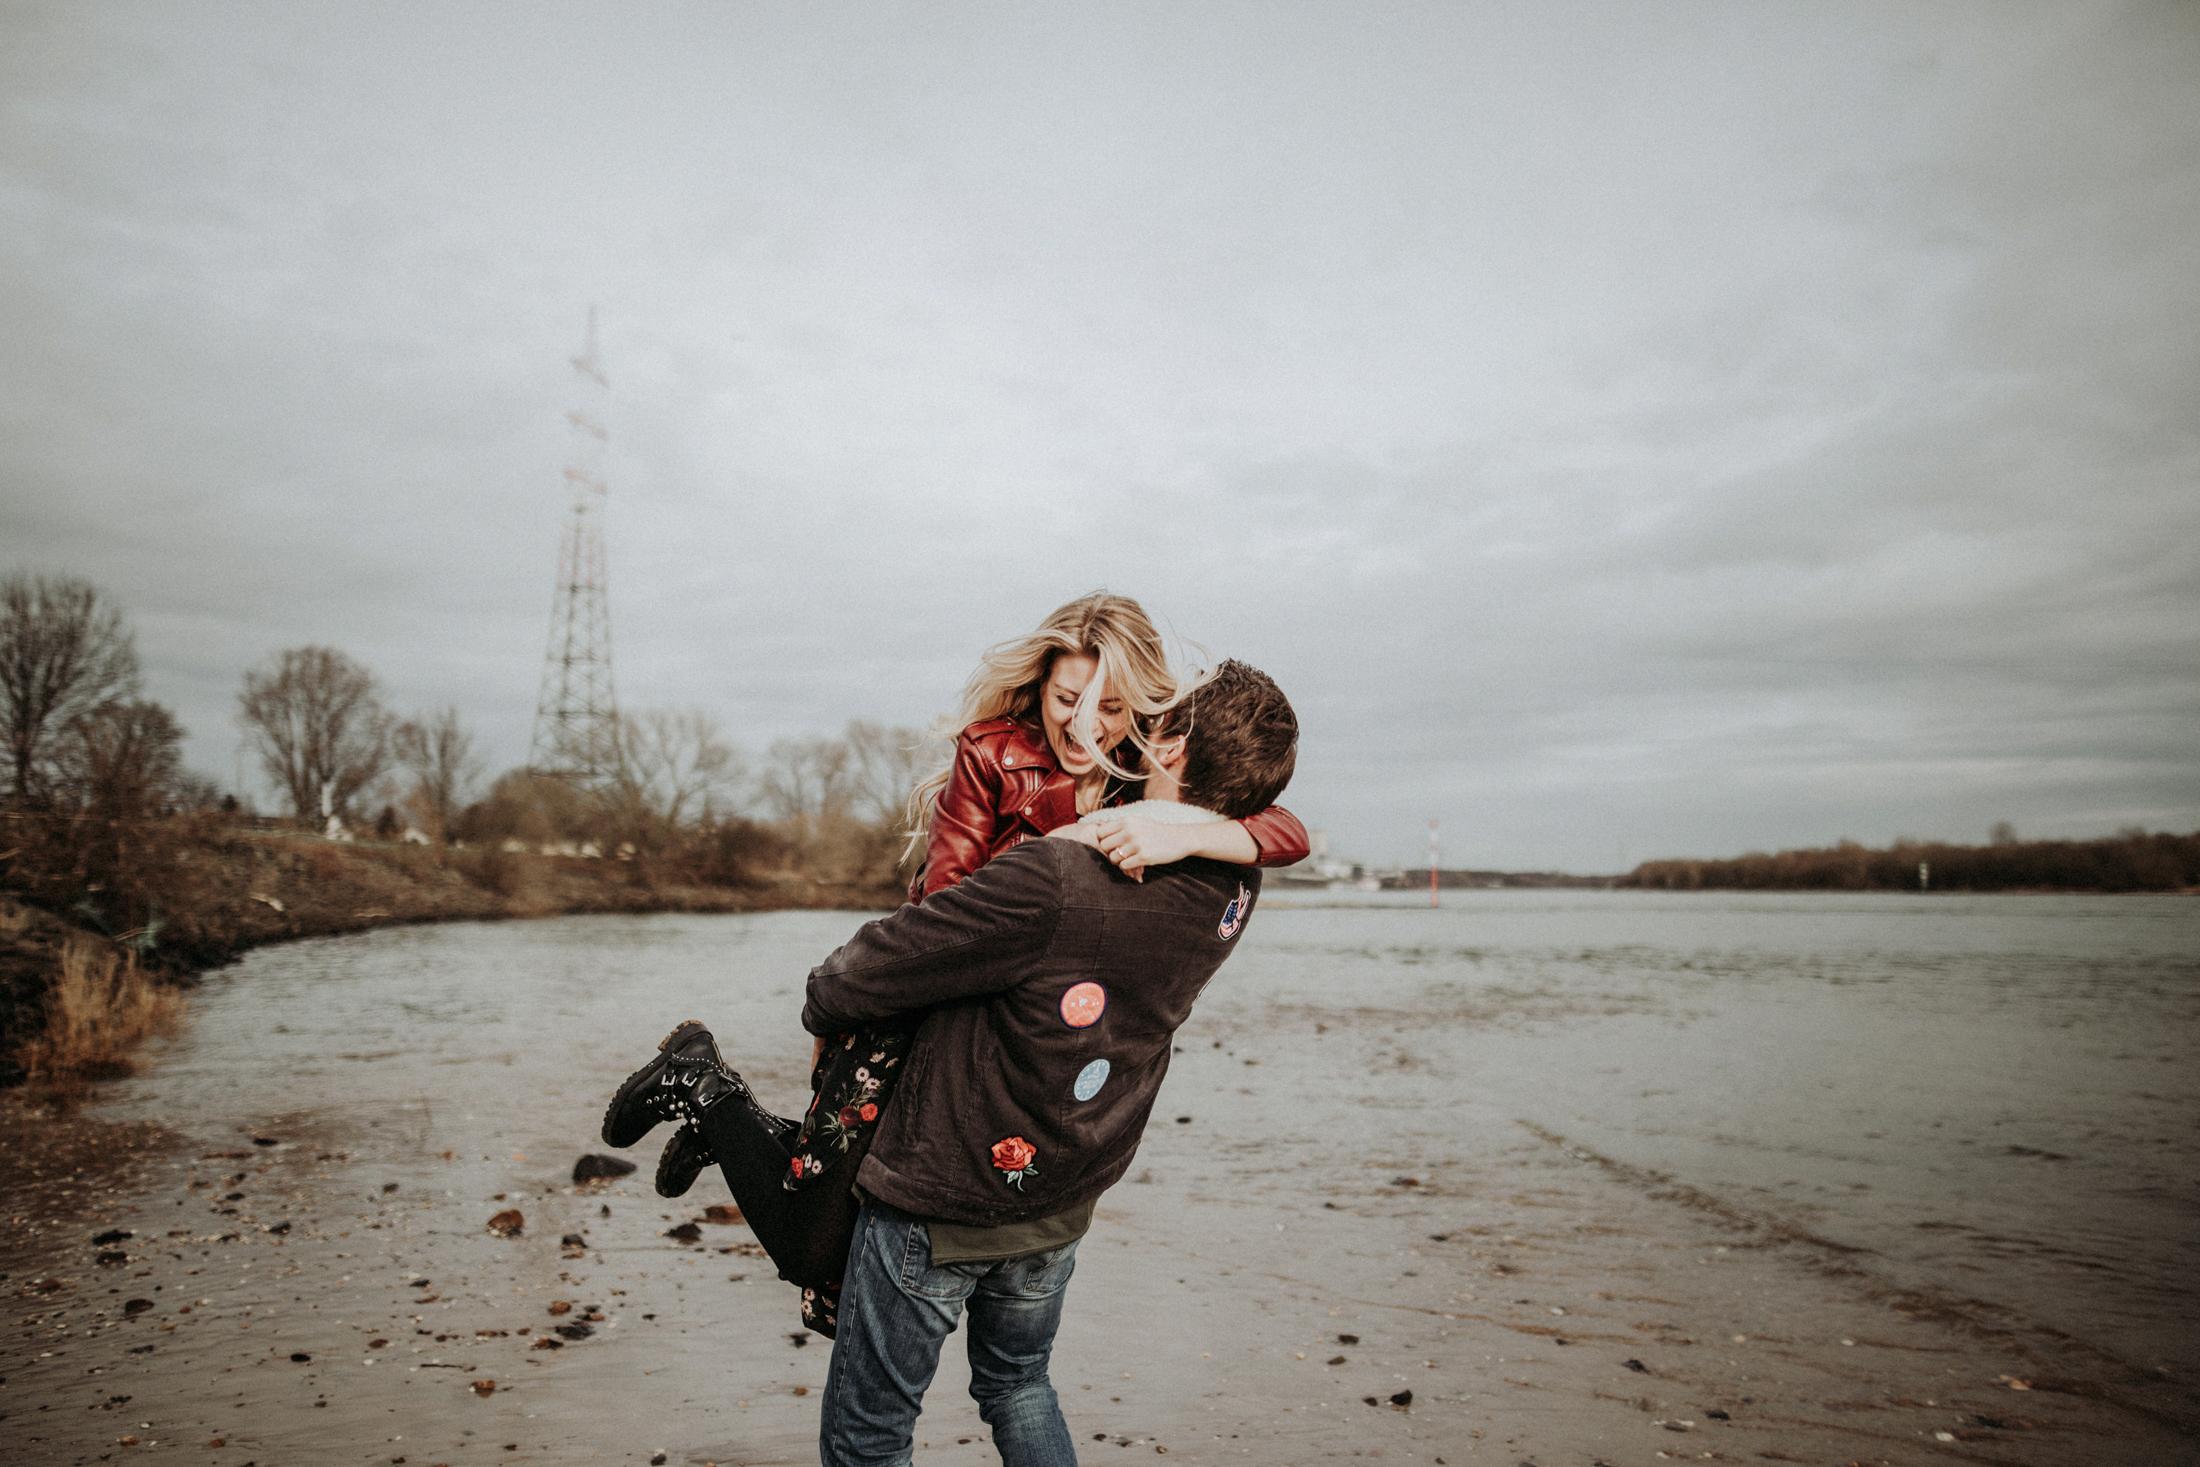 Wedding_Photographer_Mallorca_DanielaMarquardt_Photography_CanaryIslands_Lanzarote_Iceland_Tuscany_Santorini_Portugal_NewYork_Spain_Elopement_Hochzeitsfotograf_CK11